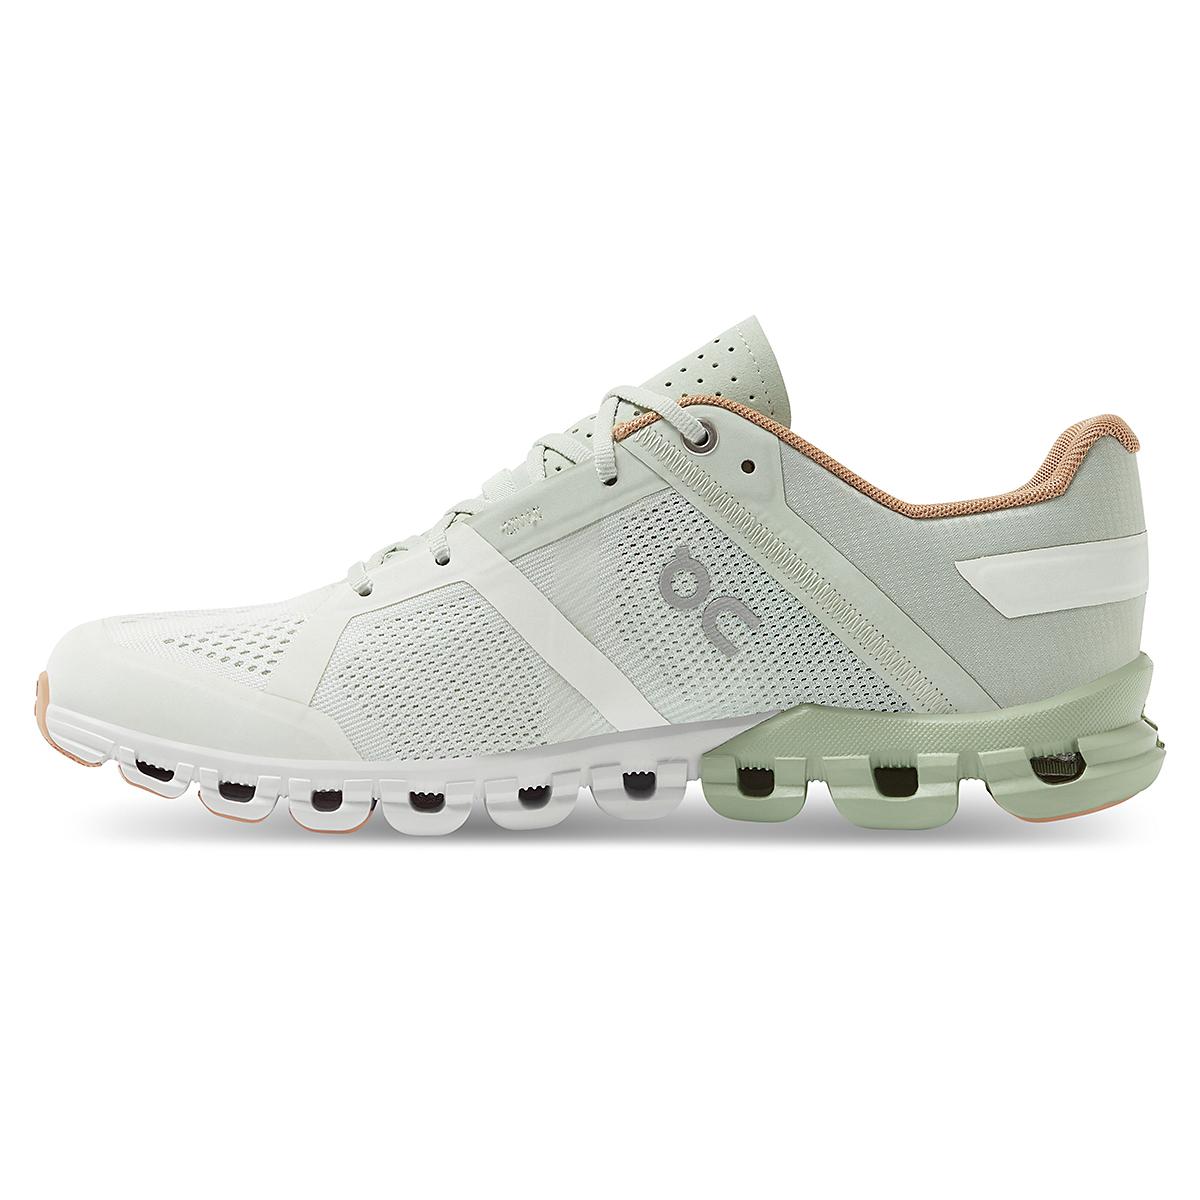 Women's On Cloudflow 2.0 Running Shoe - Color: Aloe/White - Size: 5 - Width: Regular, Aloe/White, large, image 2